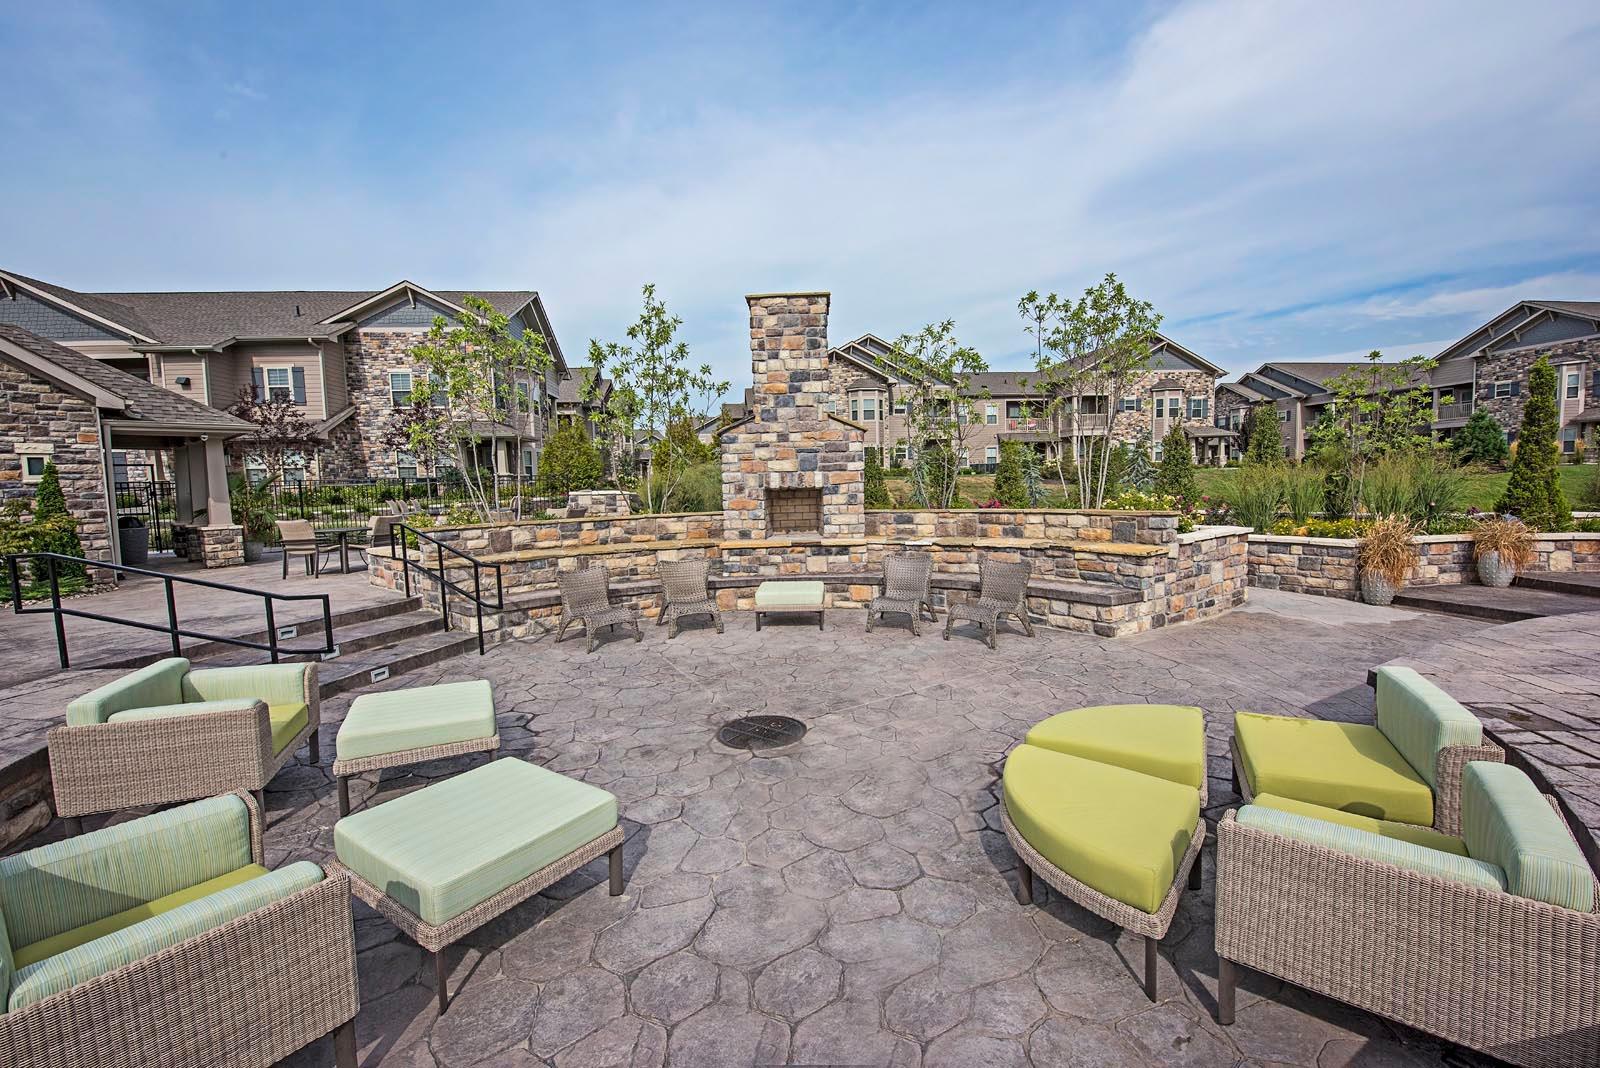 Arium Apartments Overland Park Kansas